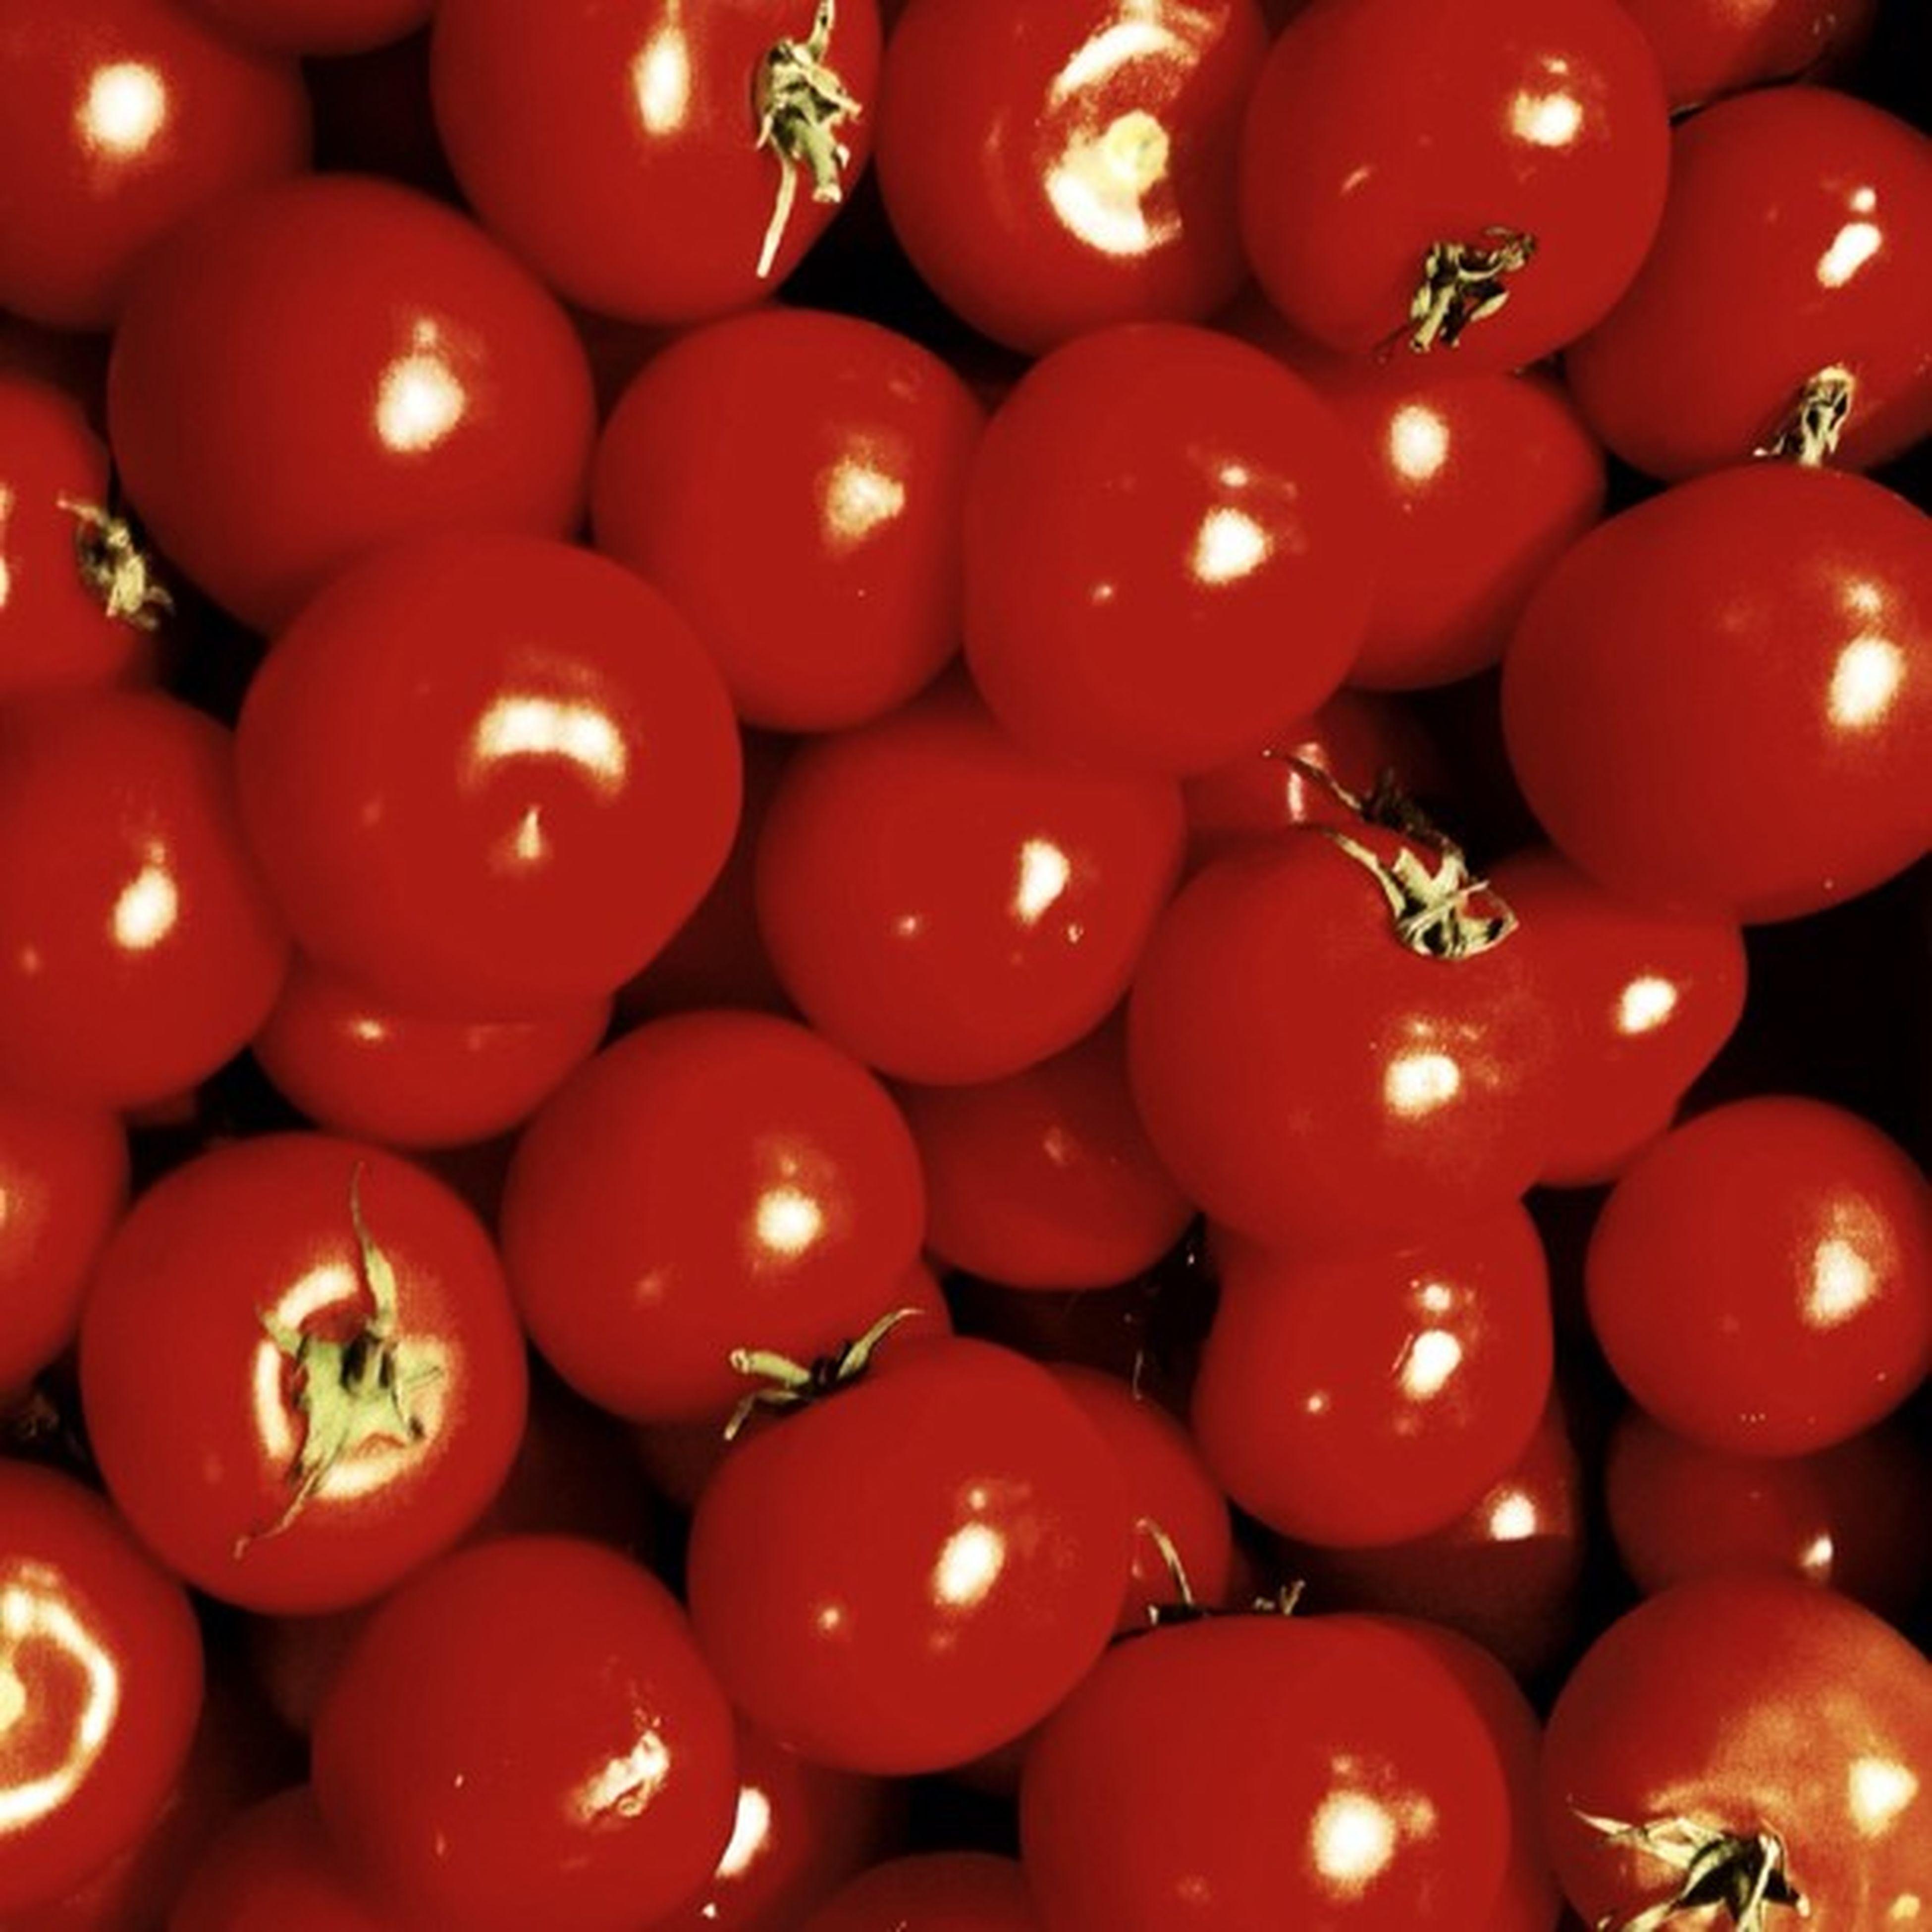 #tomato anyone? ?#veg #red Red Tomato Veg